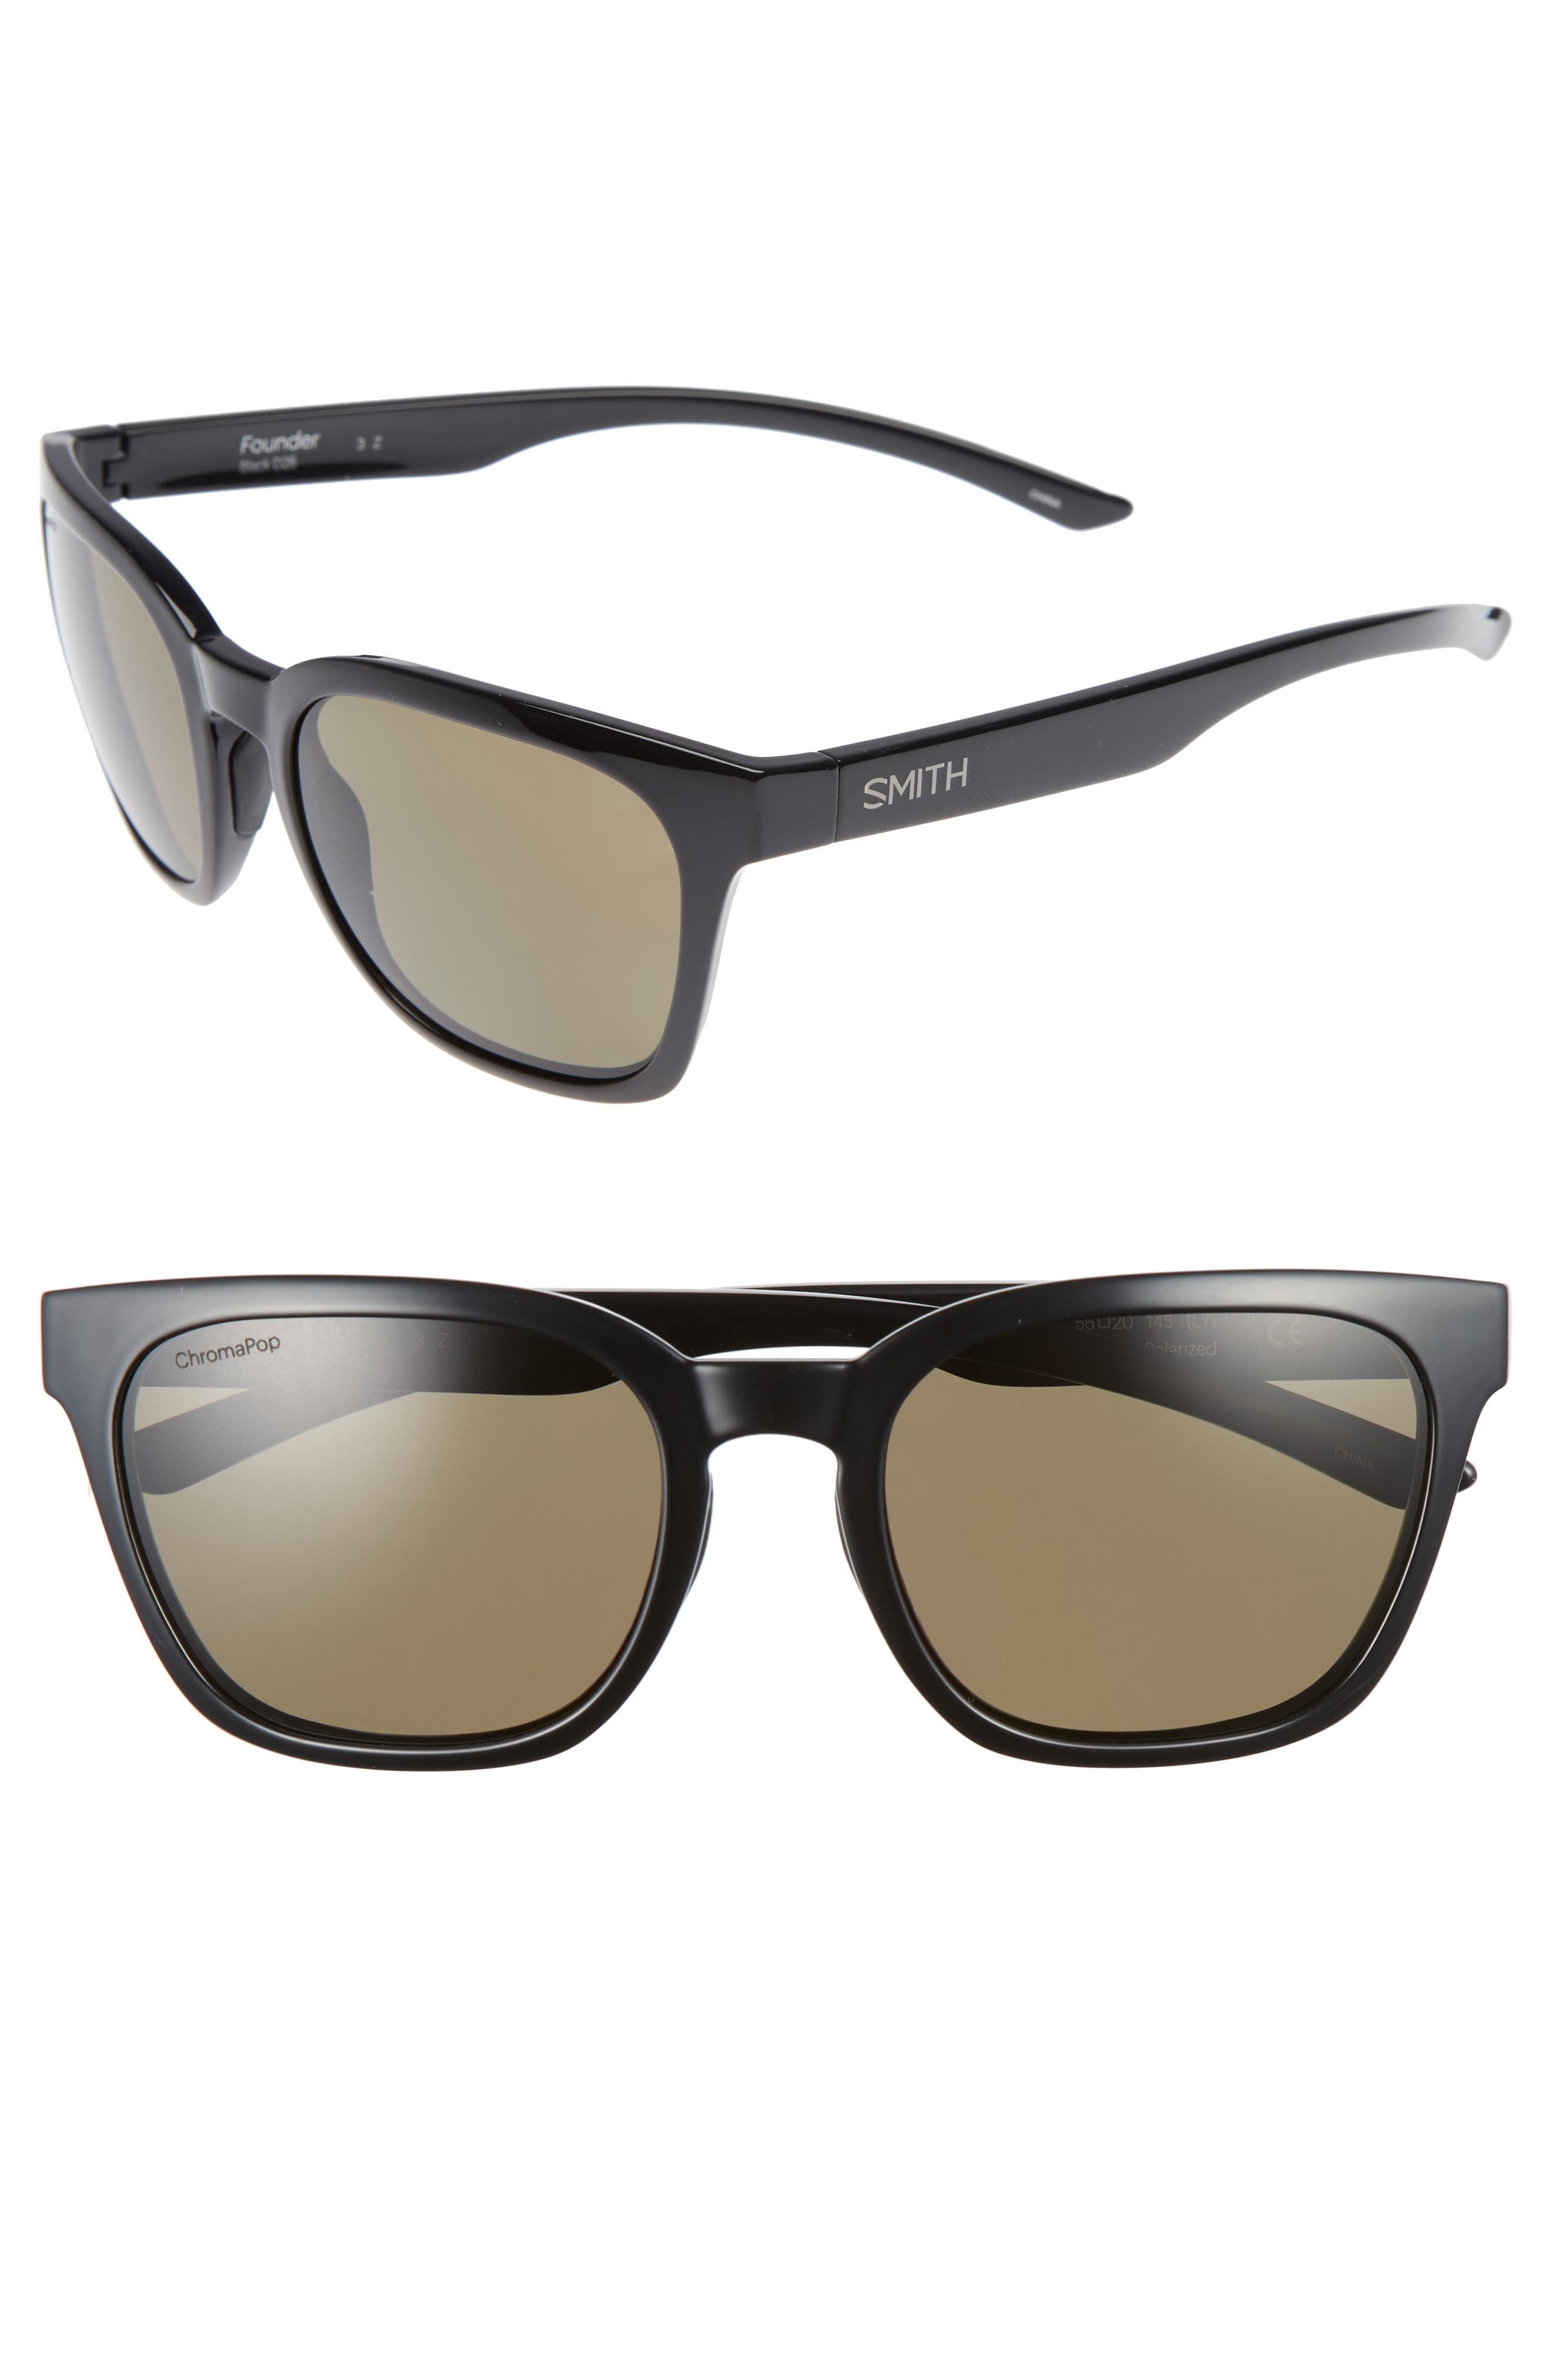 Founder 55mm ChromaPop<sup>™</sup> Polarized Sunglasses,                         Main,                         color, Black/ Gray Green